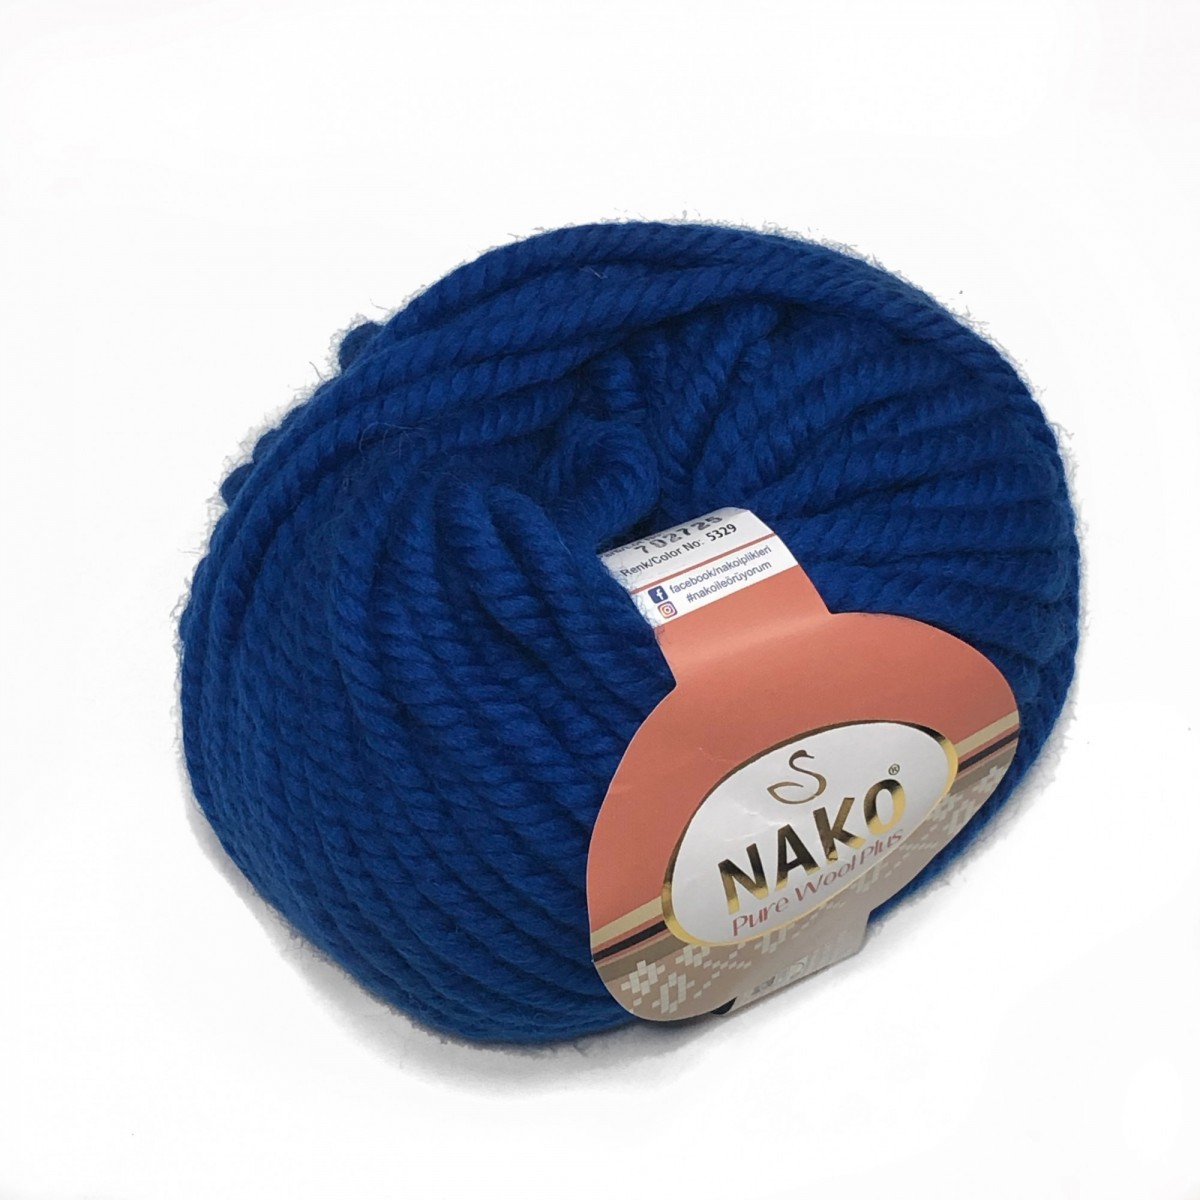 Пряжа Нако Пьюр Вул Плюс (Pure Wool Plus)